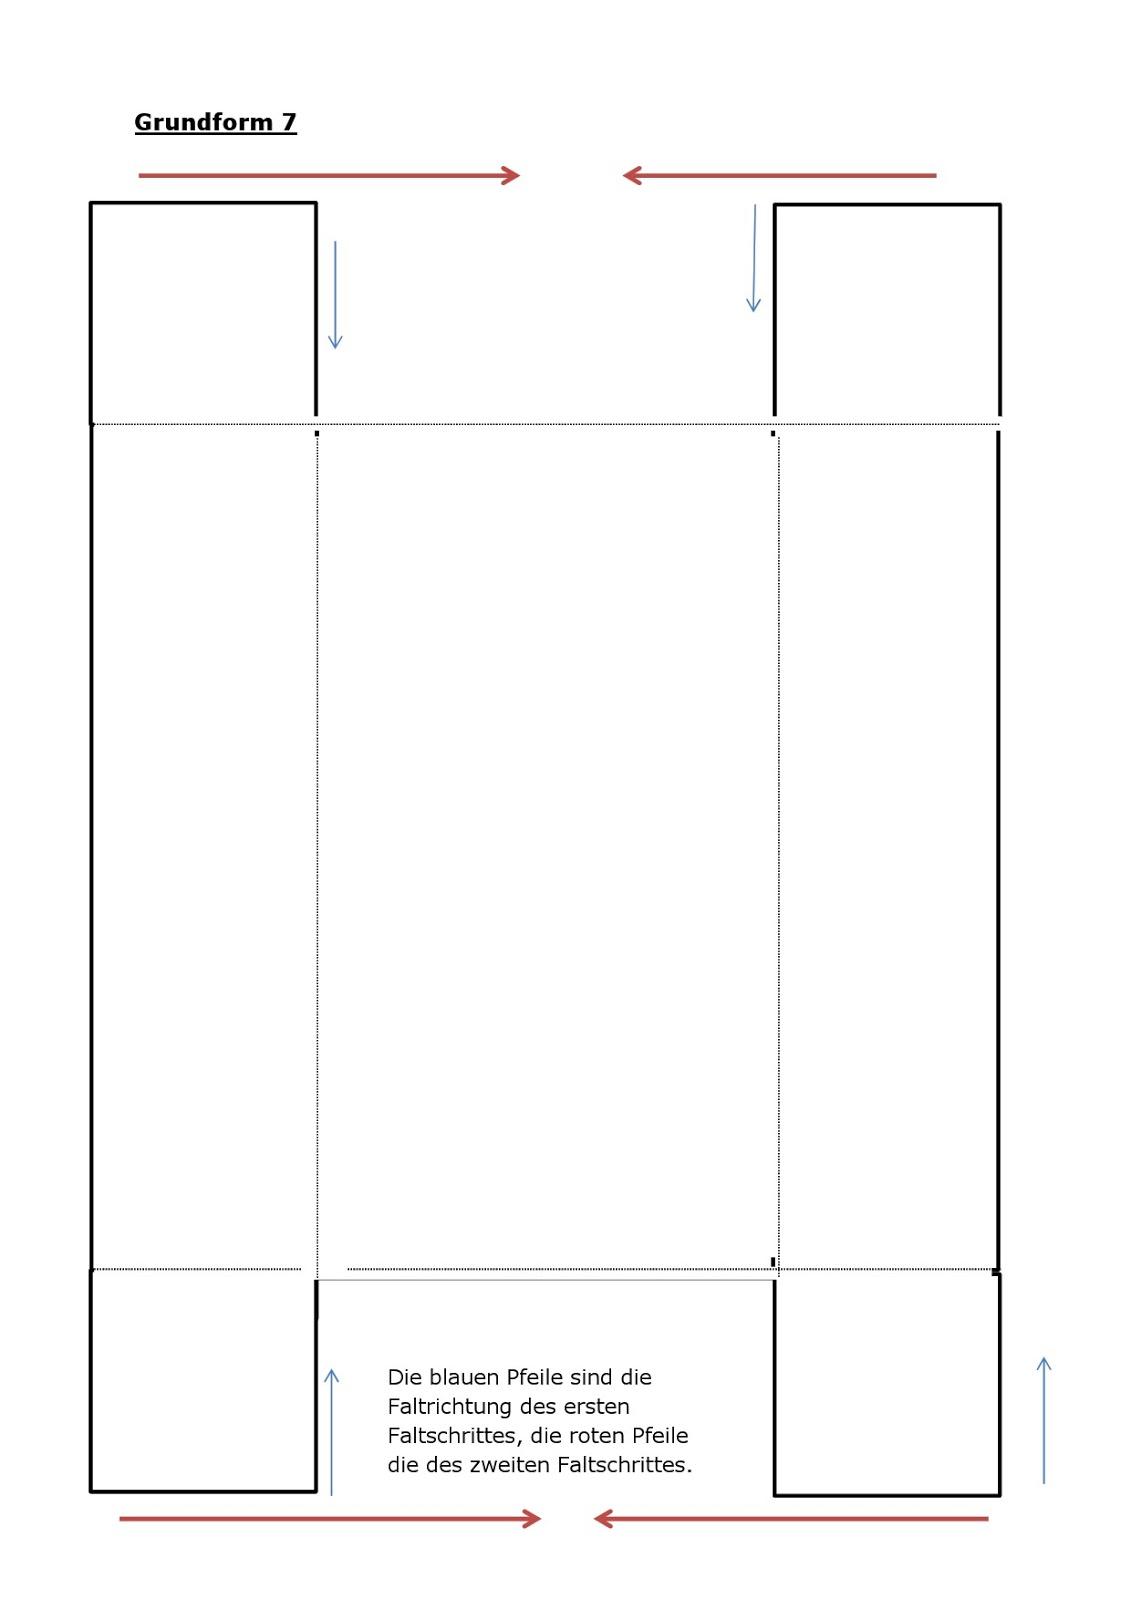 lapbook creativos, lapbook ideas, lapbook printable, lap books, lapbook plantillas, lapbook templates, lapbook vorlagen, lapbook free, lapbook vorlagen blanko,